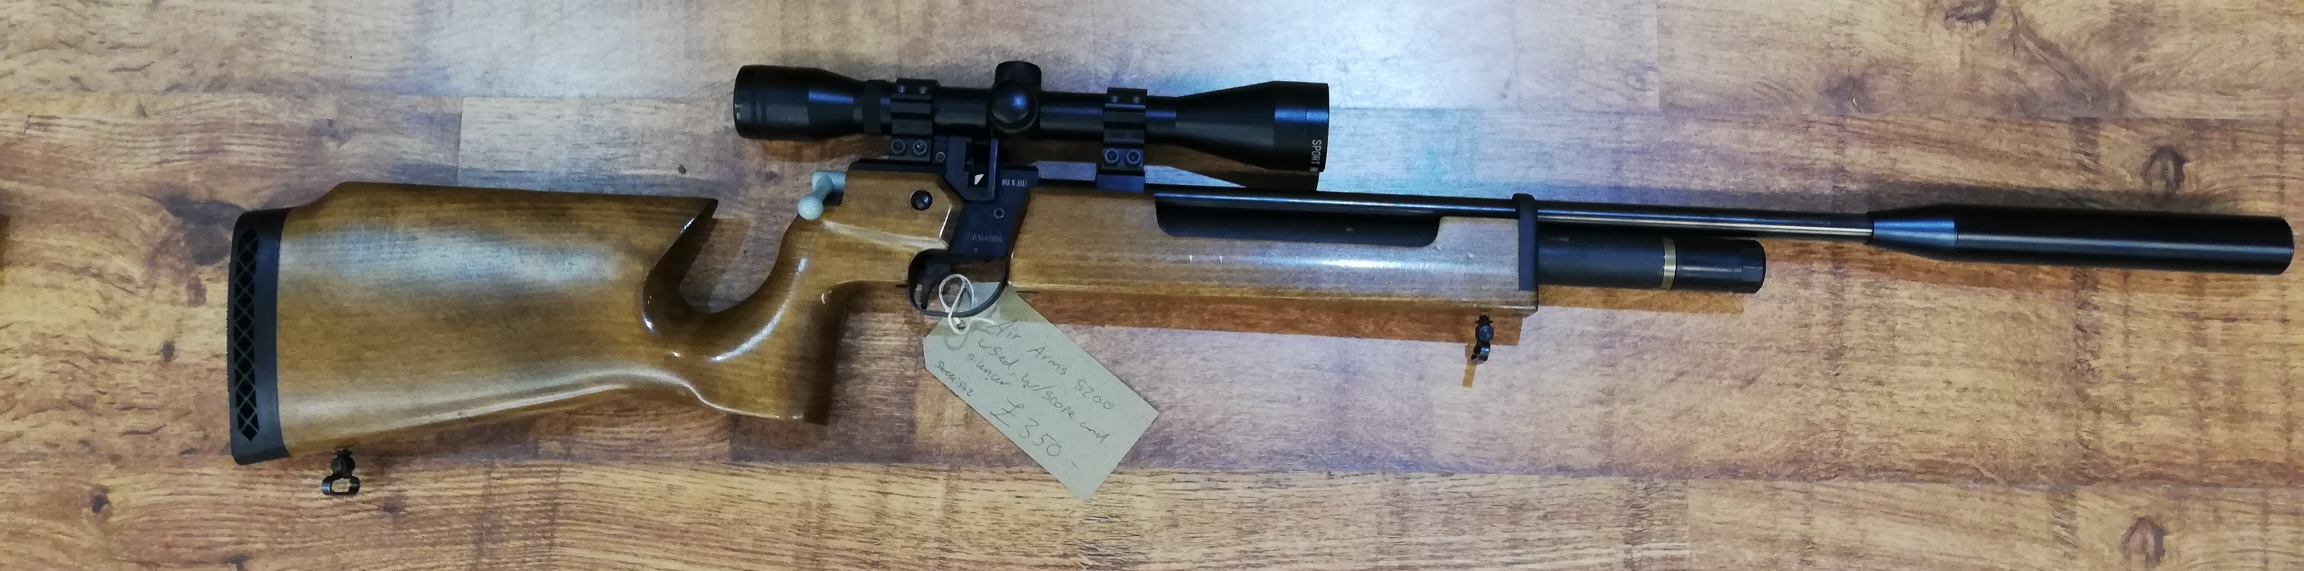 Wighill Park Guns | Leading UK retailer of Shooting Supplies